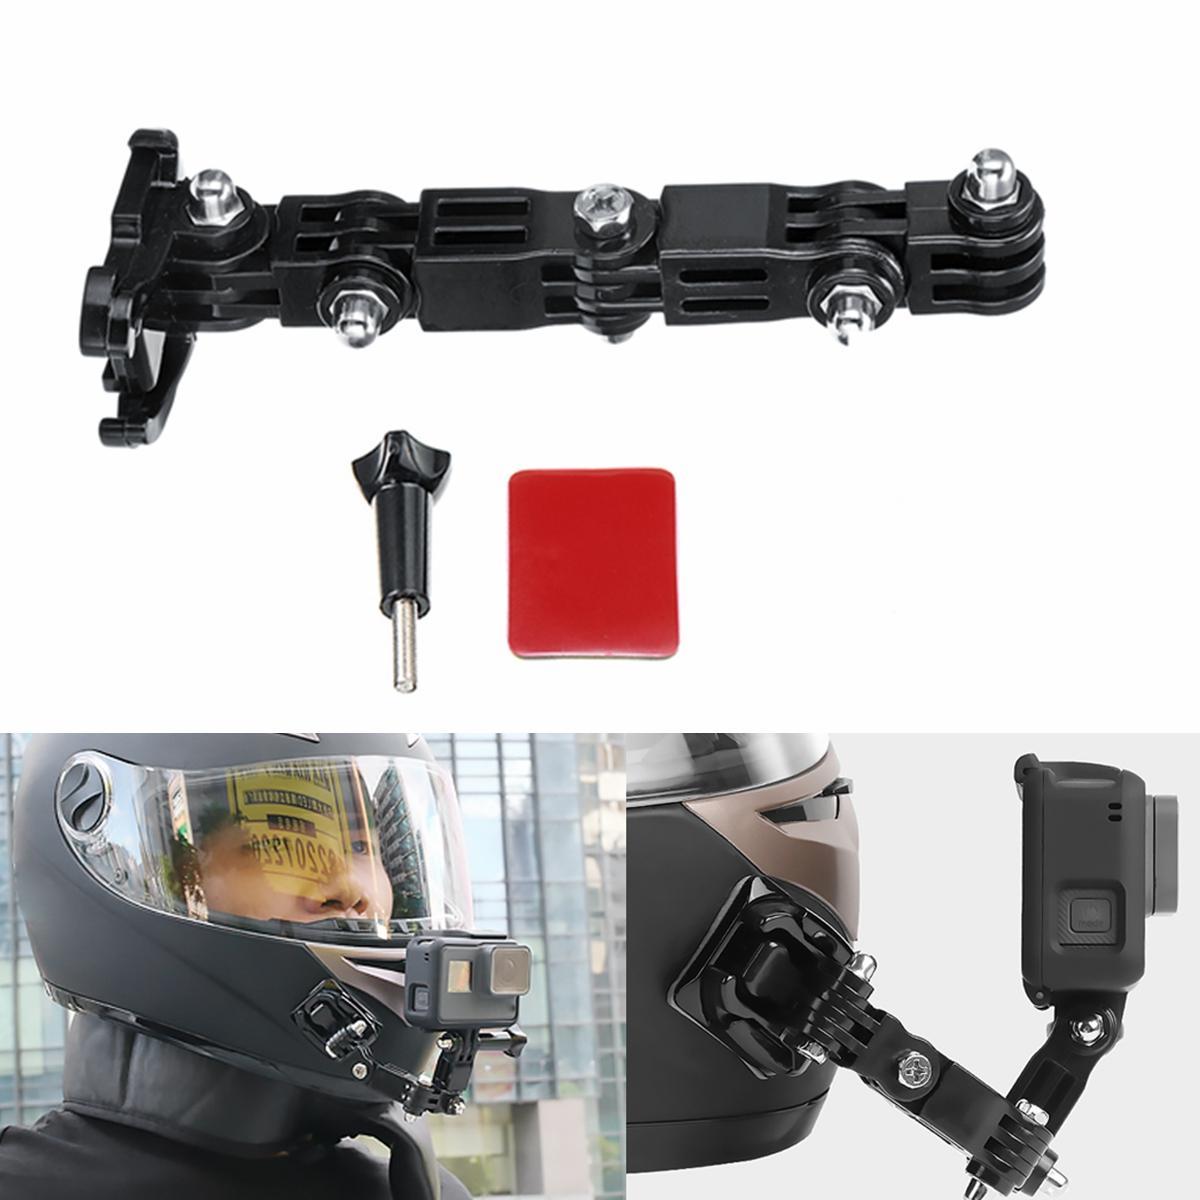 Adhesive Full Face Helmet Front Chin Mount For Sjcam Antshares Gopro Hero 6 5 4 3 Action Camera